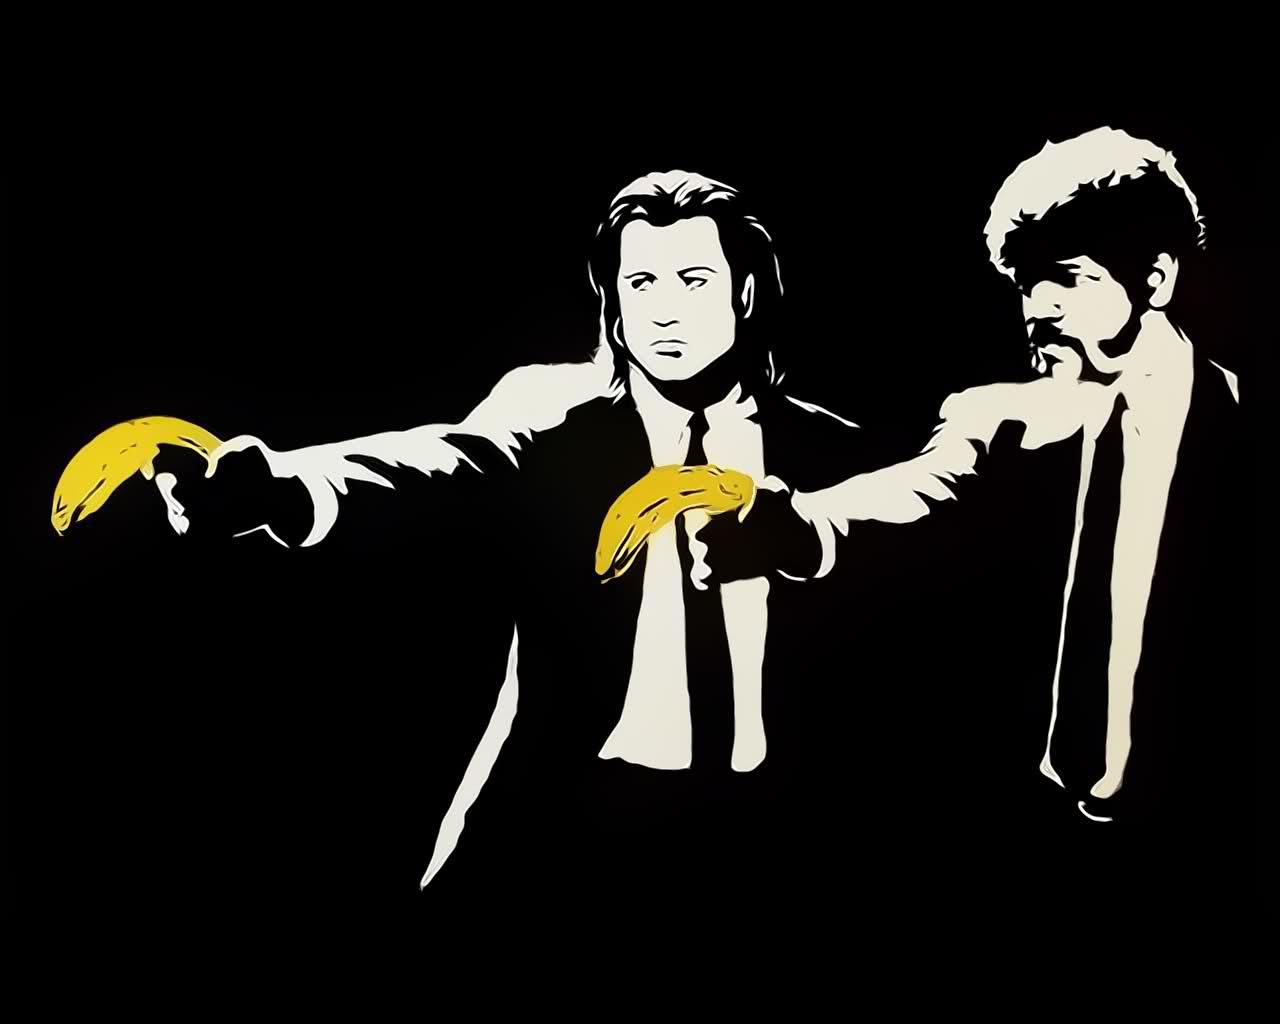 Banksy-1920×1080-Banksy-Adorable-wallpaper-wp3602955